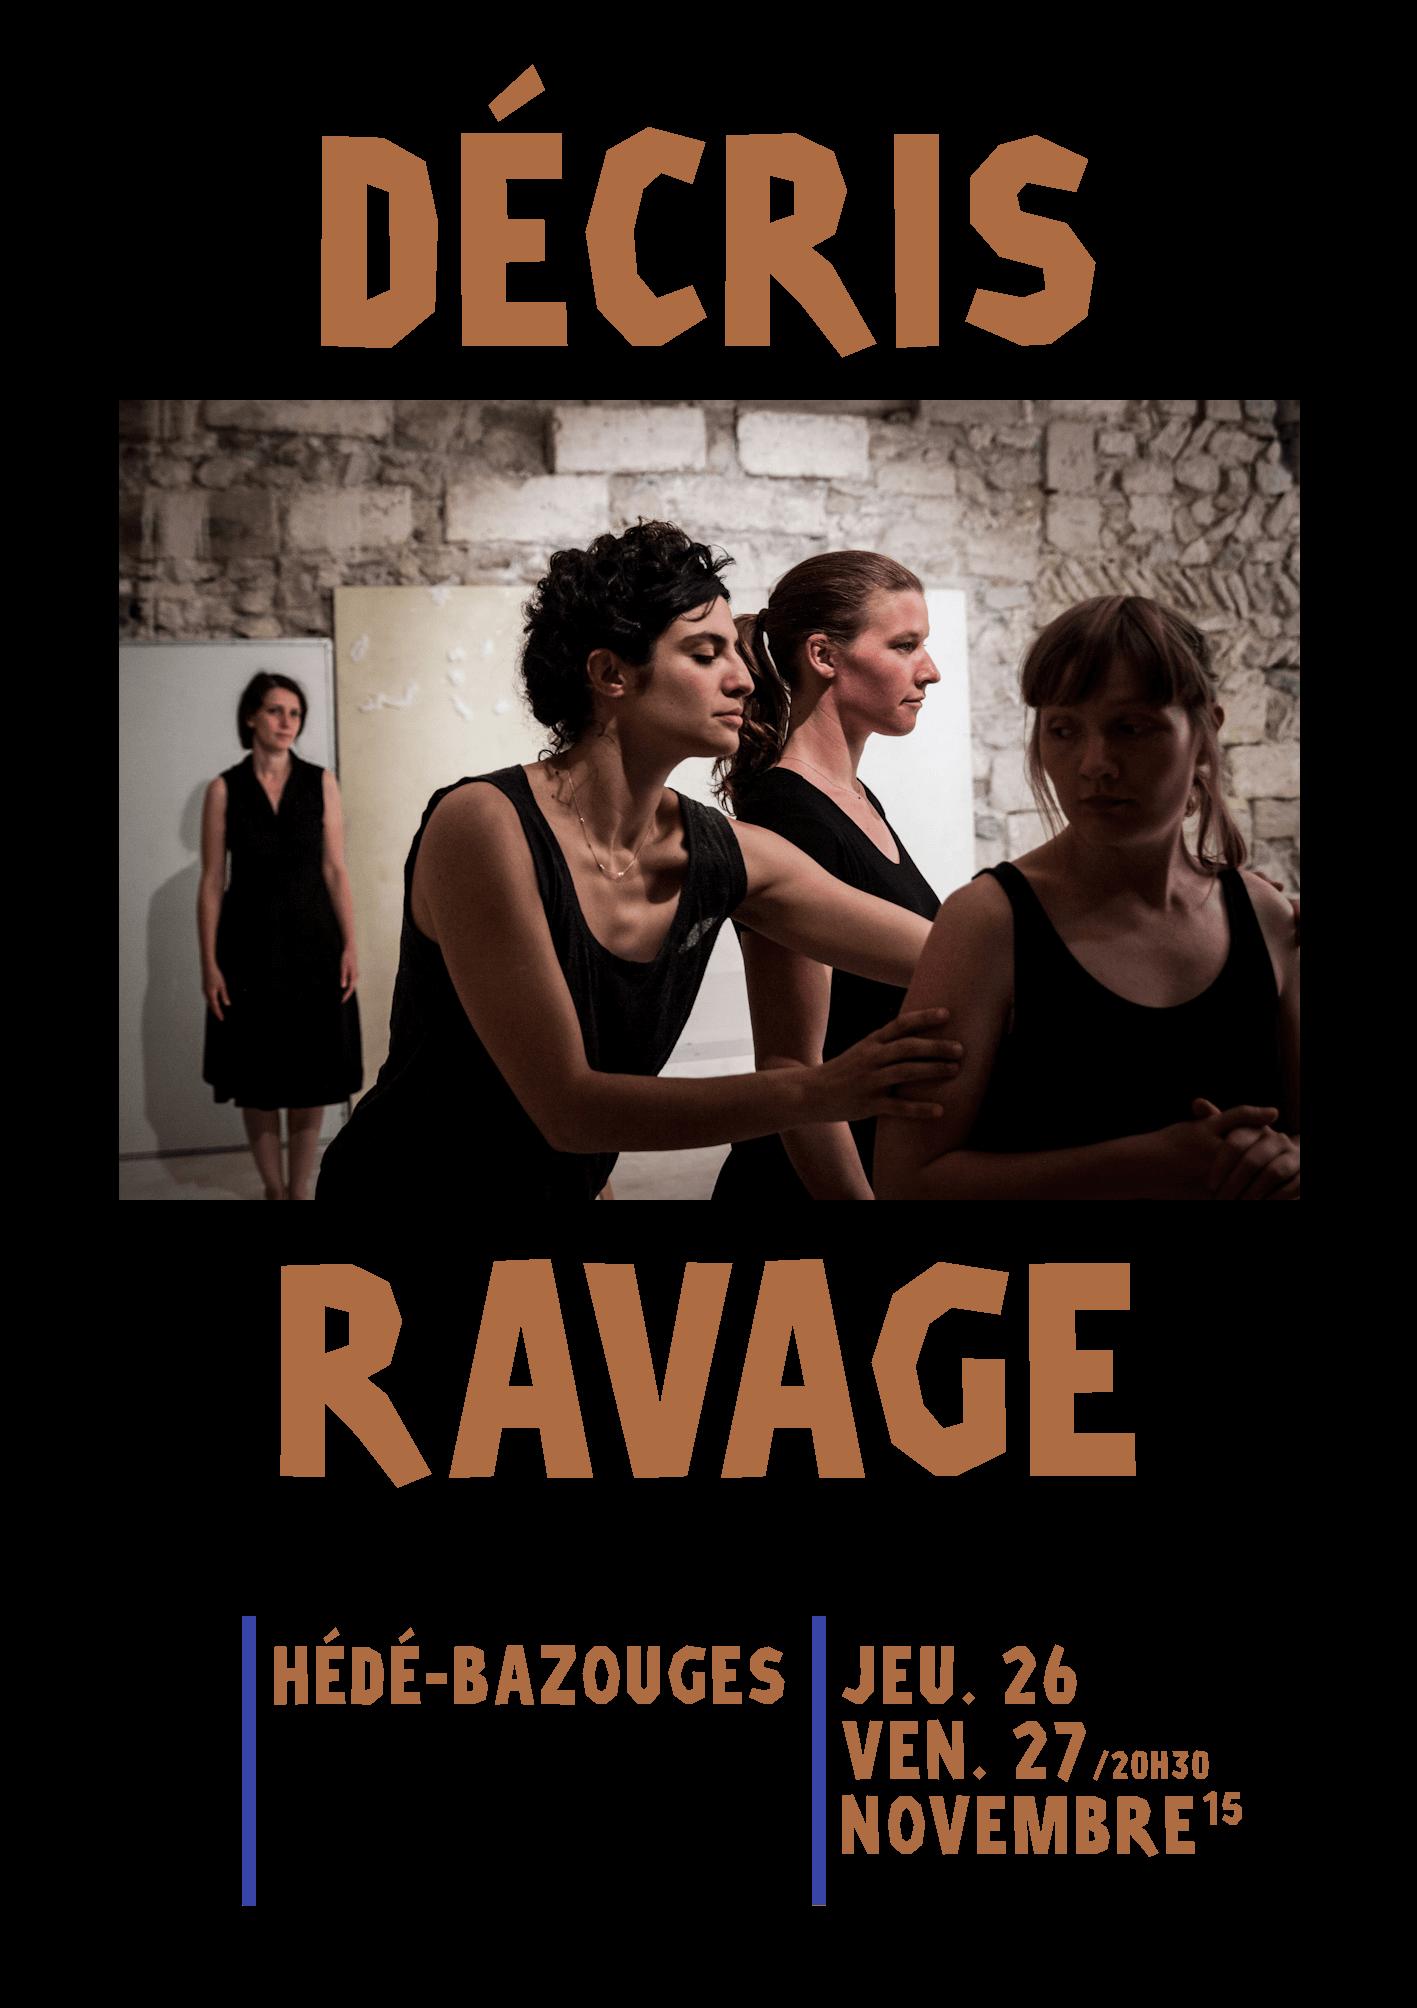 DECRIS-RAVAGE